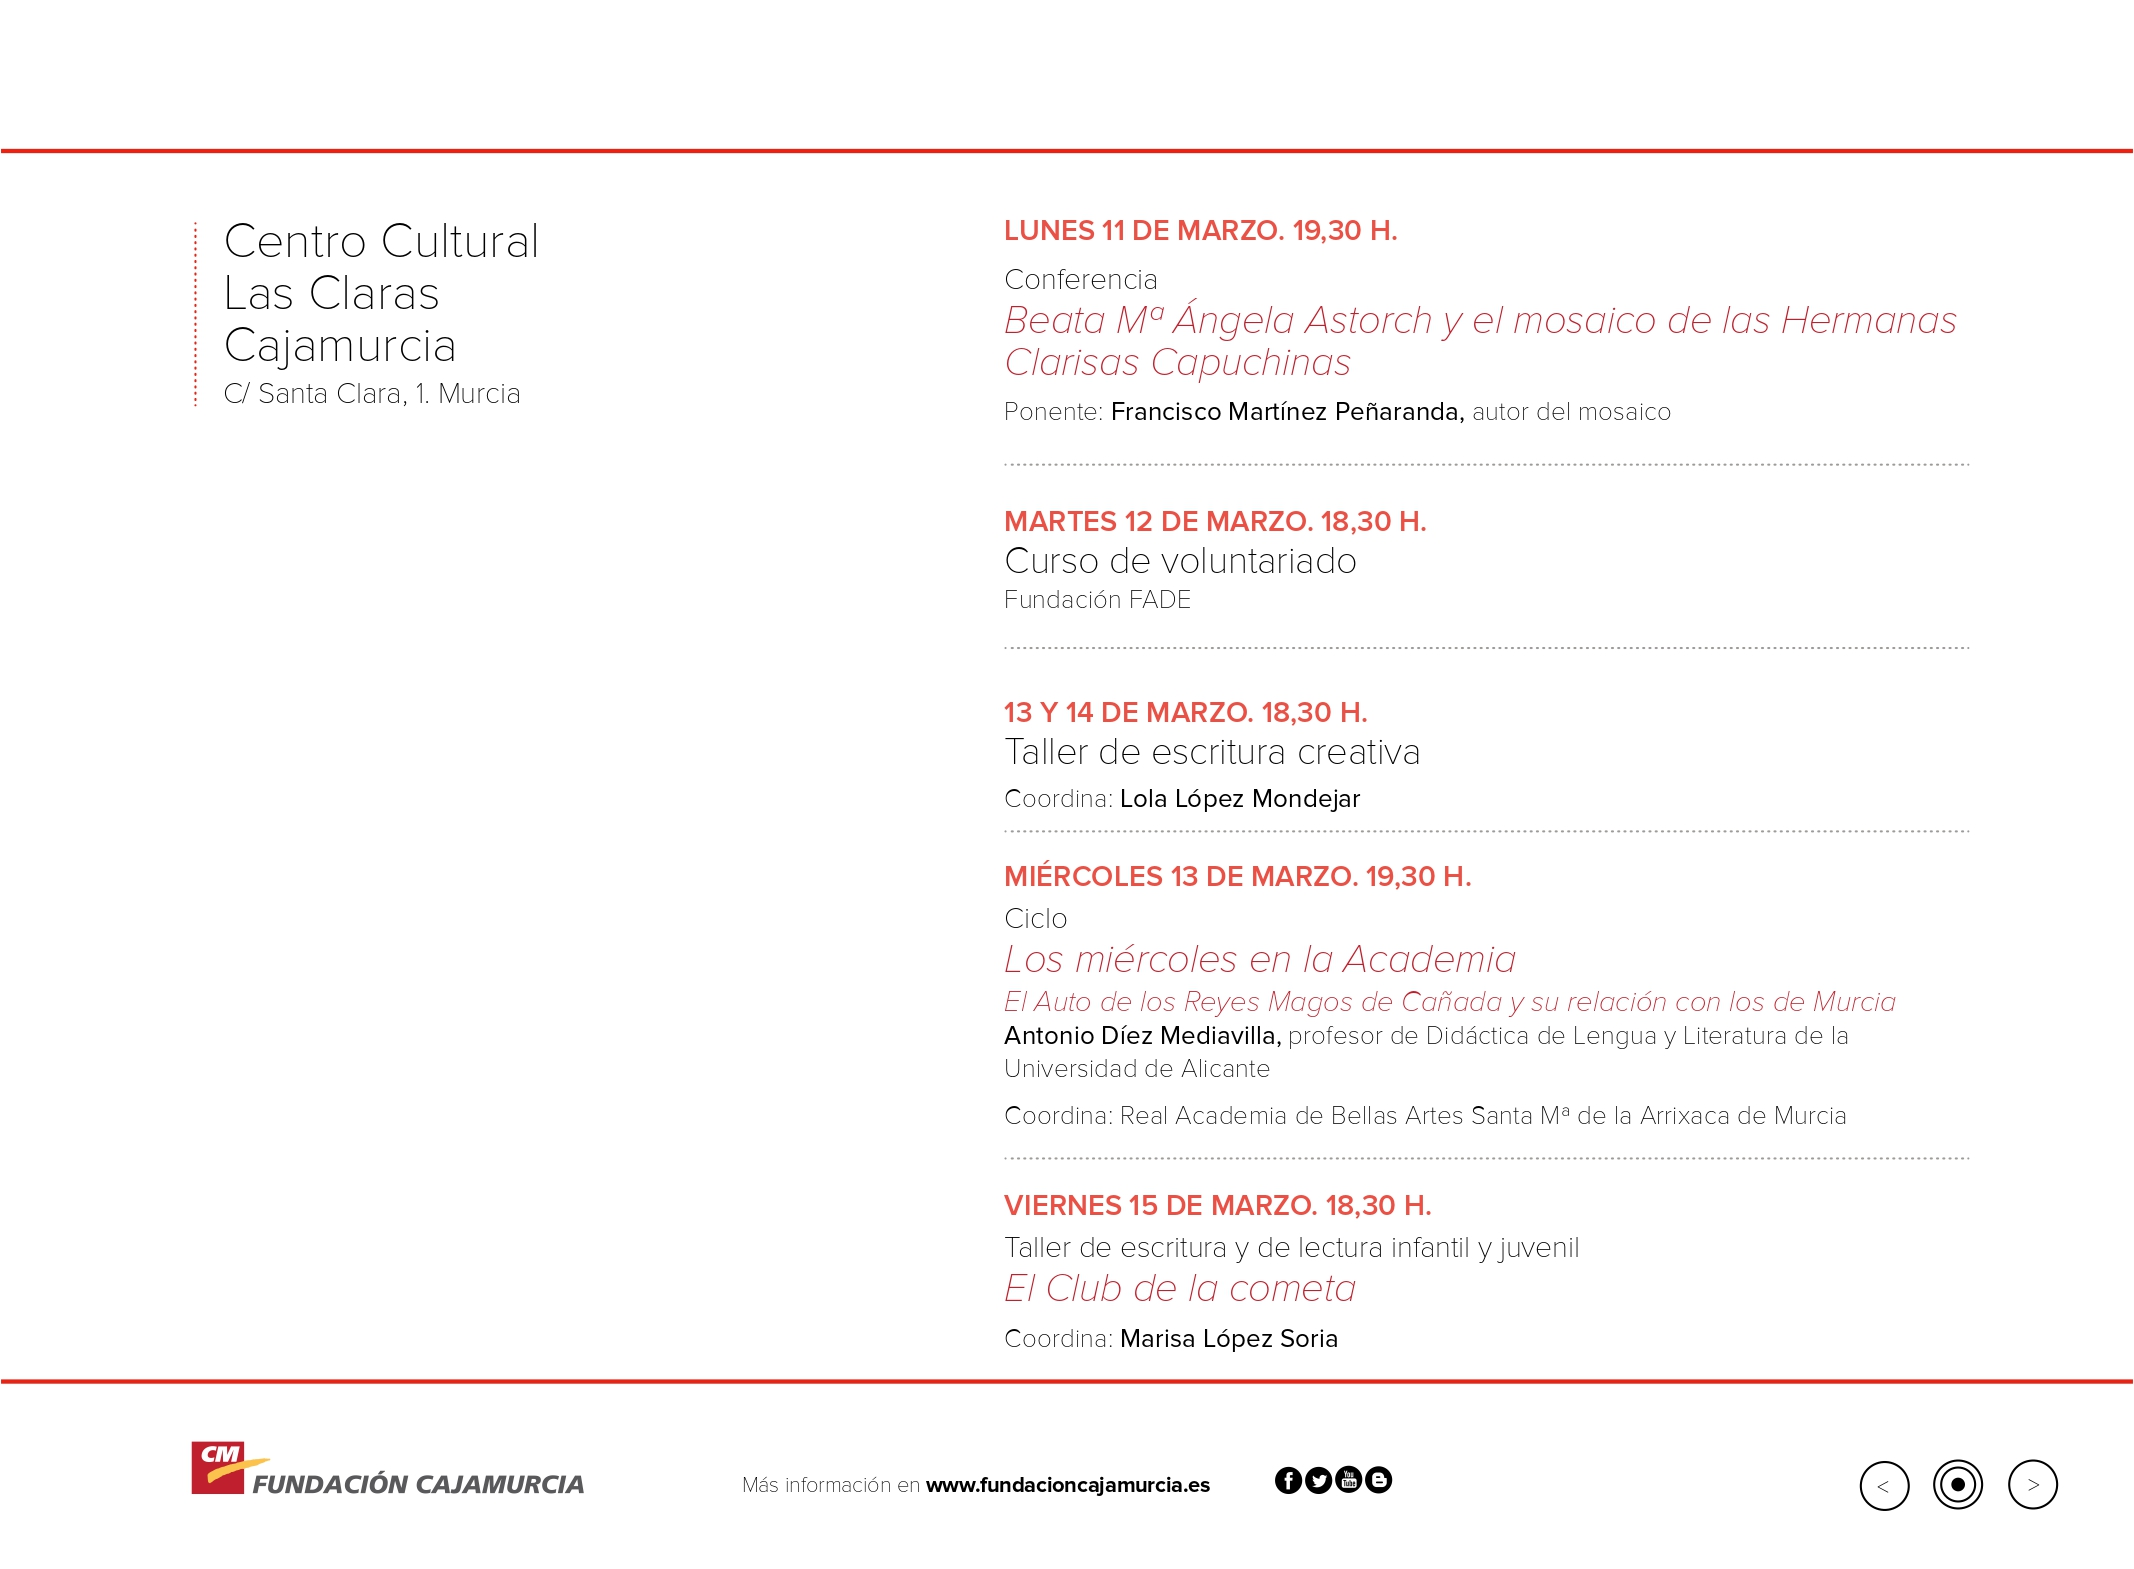 agenda-cajamurcia_page-0005.jpg